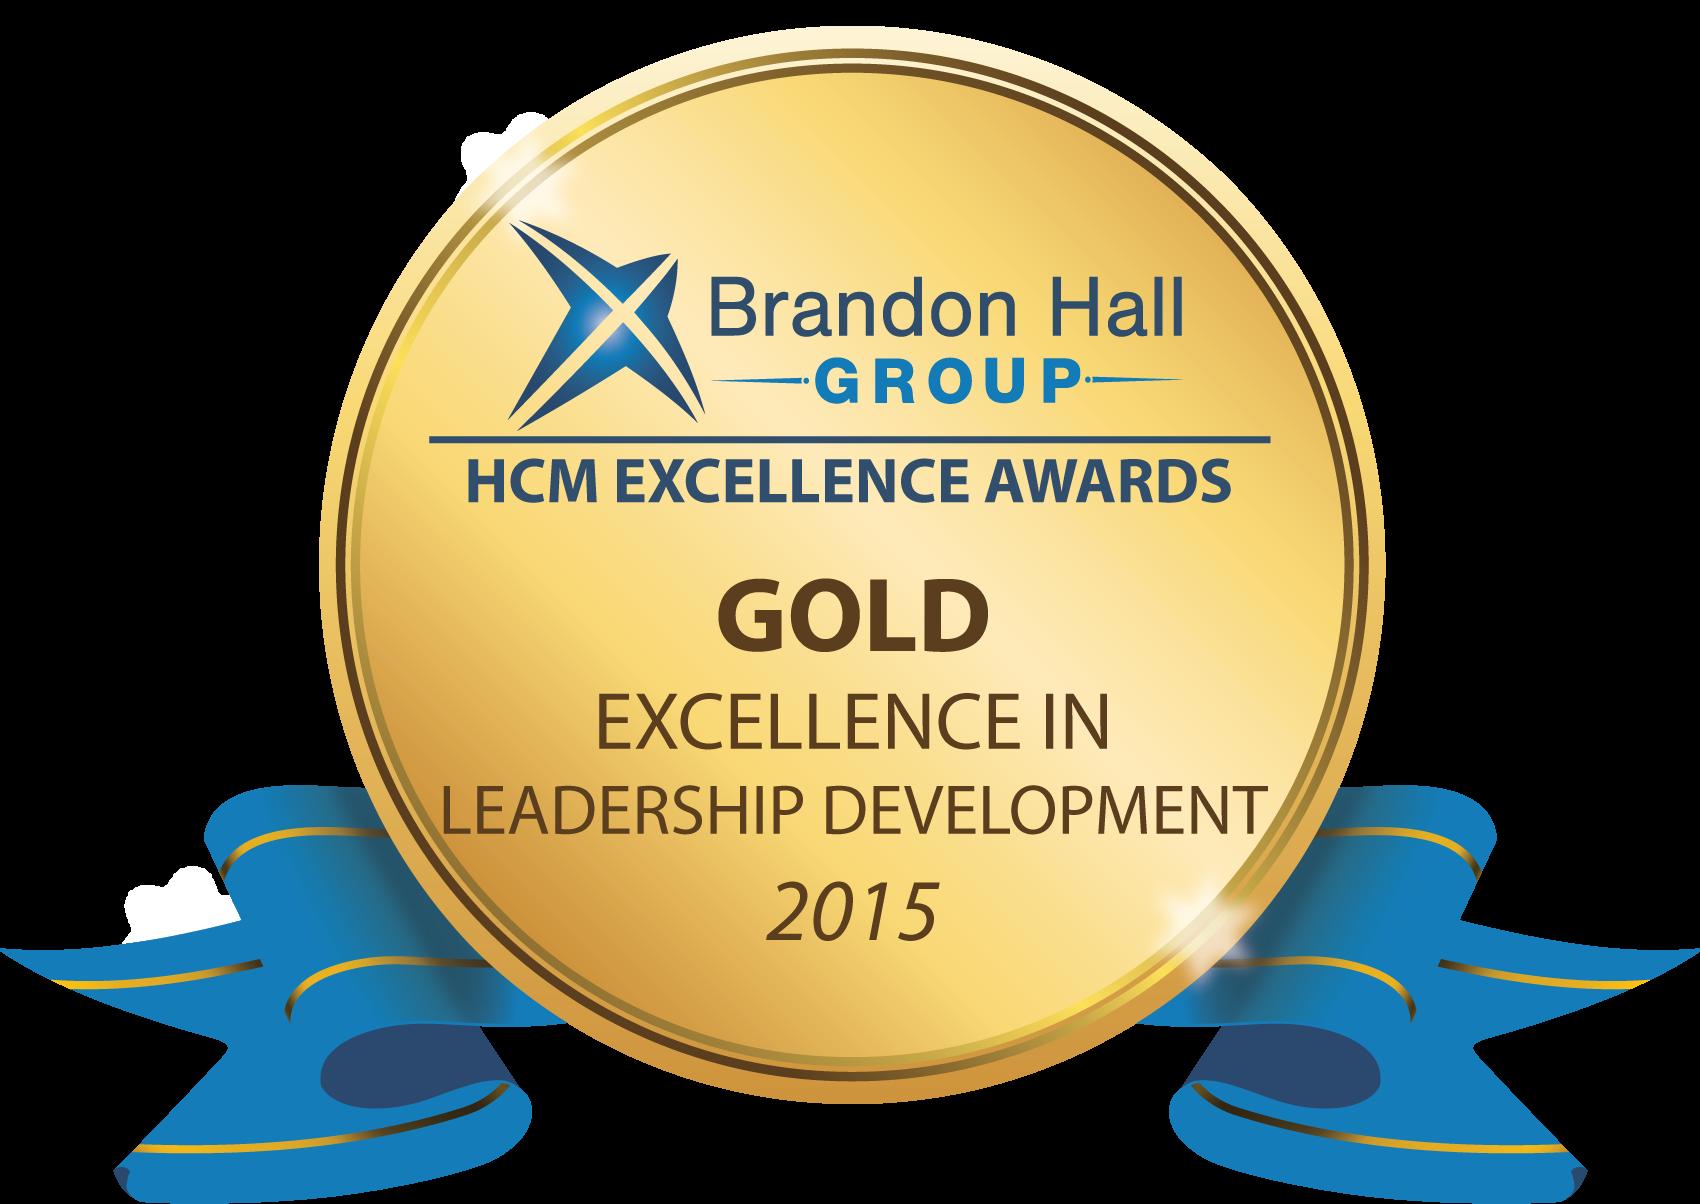 Gold Leadership Development Award